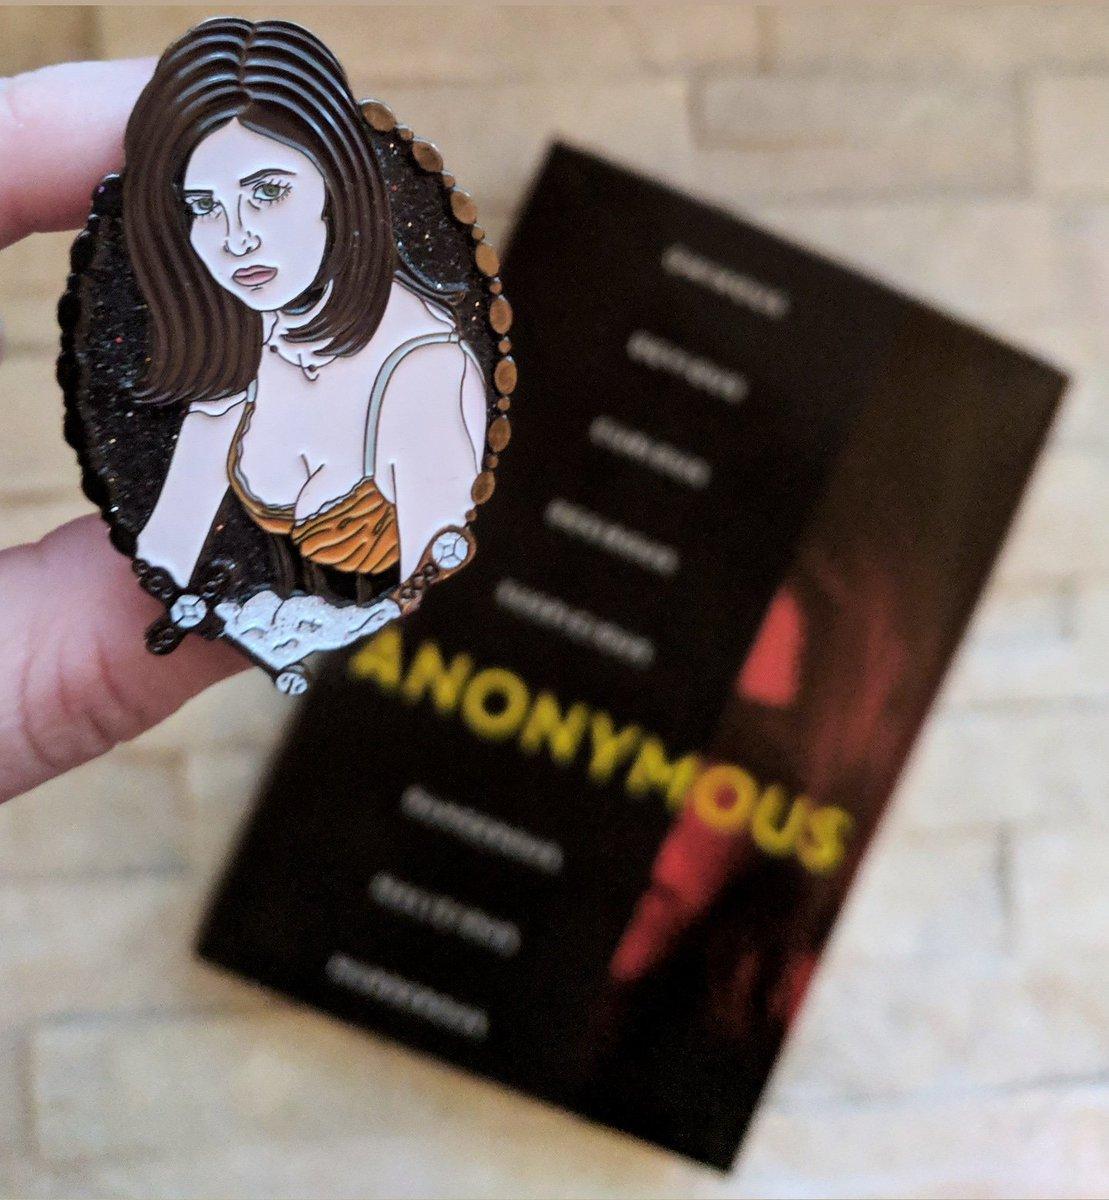 Hashtag #ananonymousgirl sur Twitter